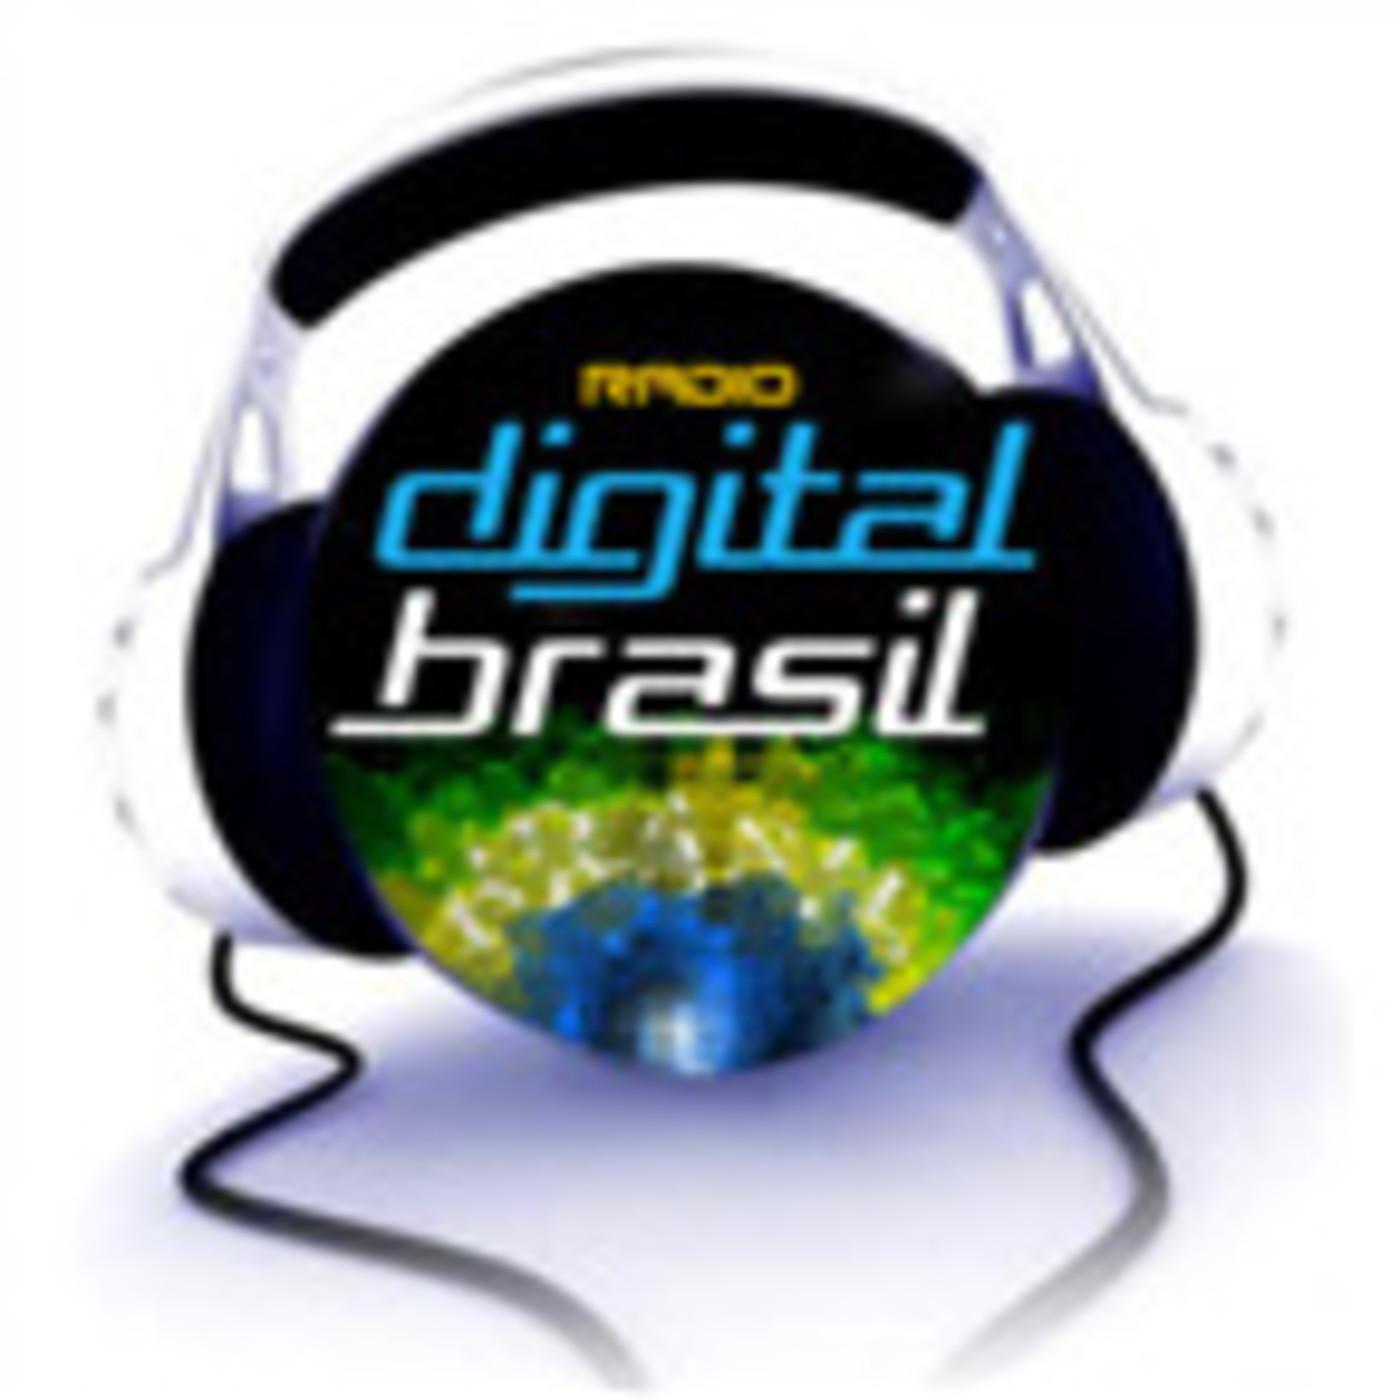 Rádio Digital Brasil